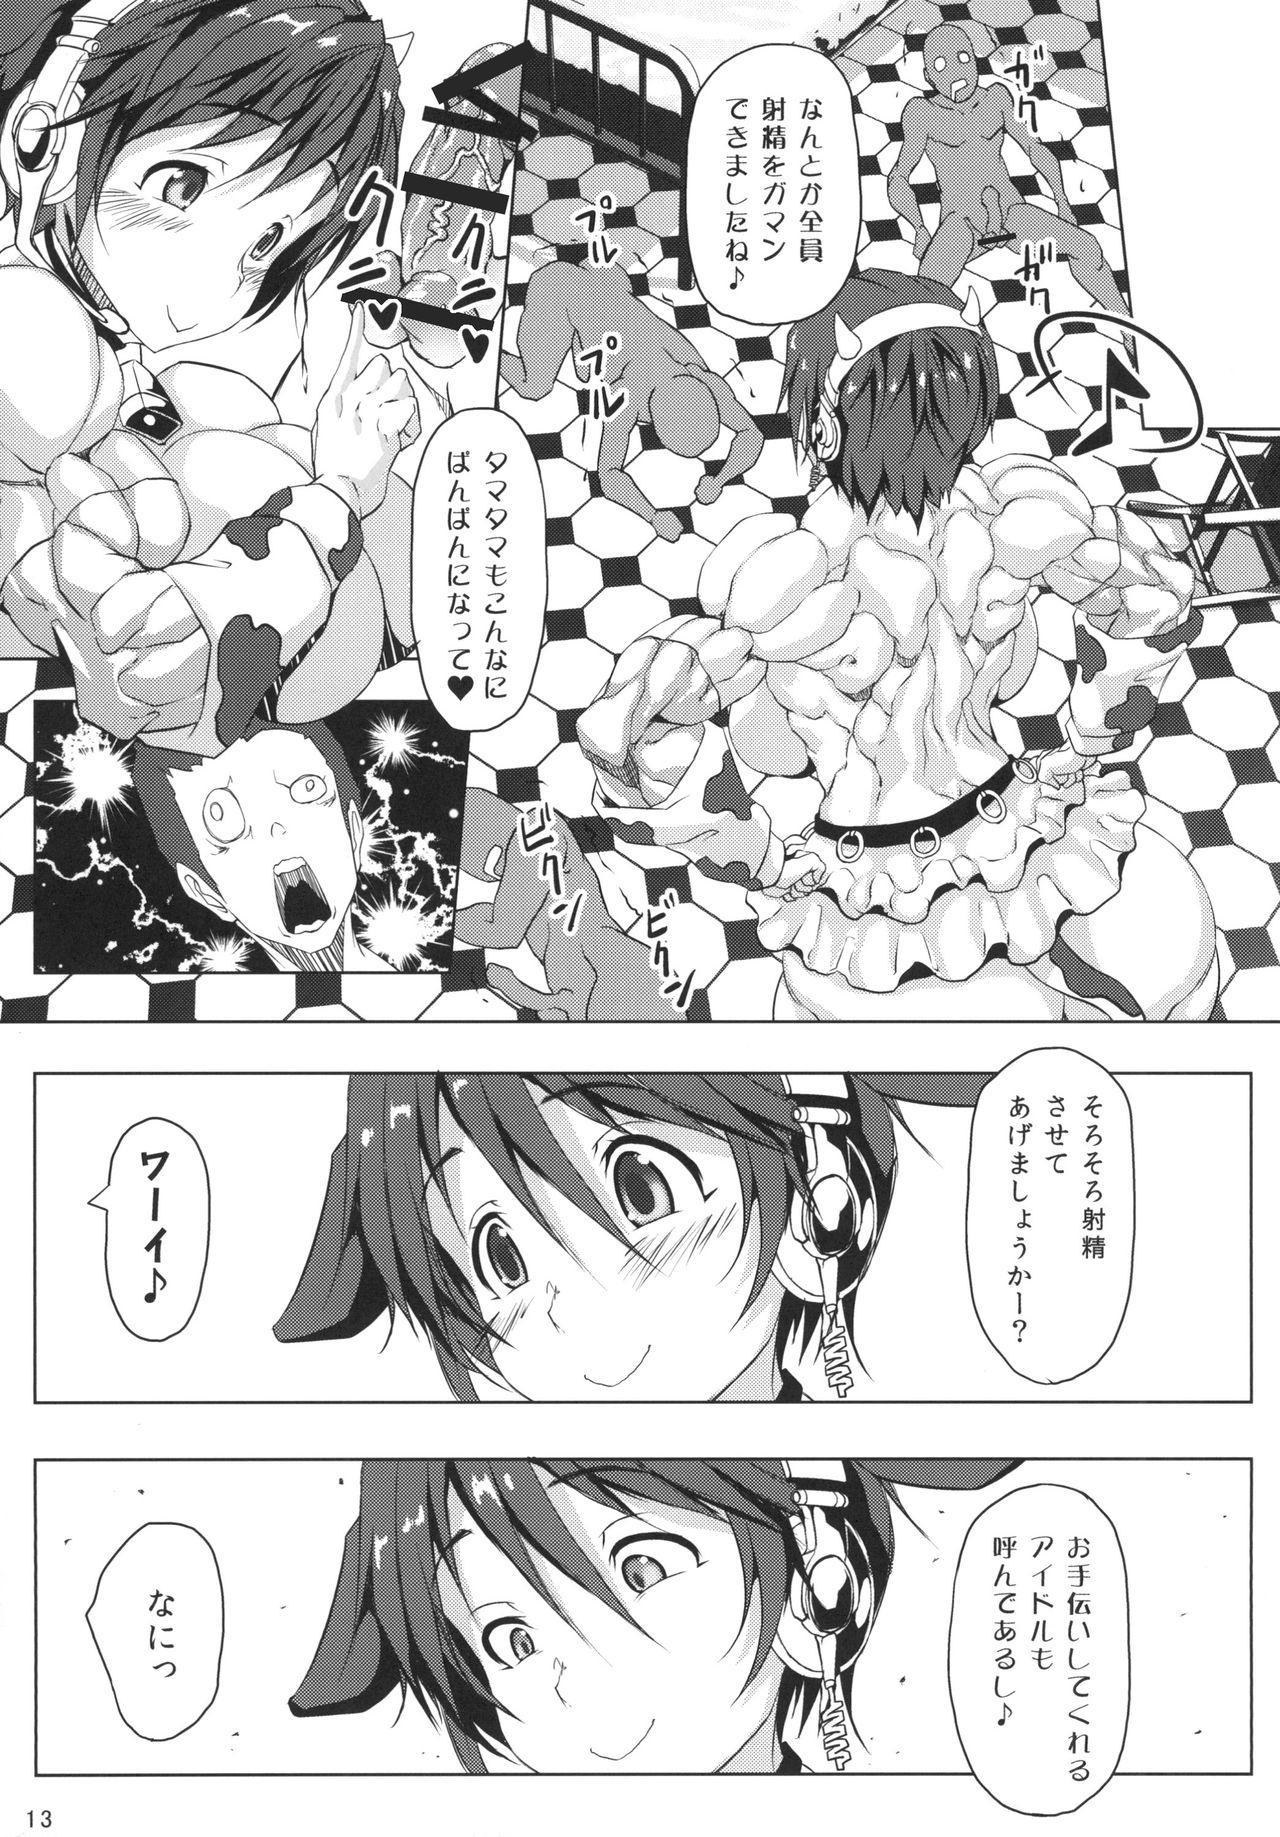 Kinniku Bokujou 12